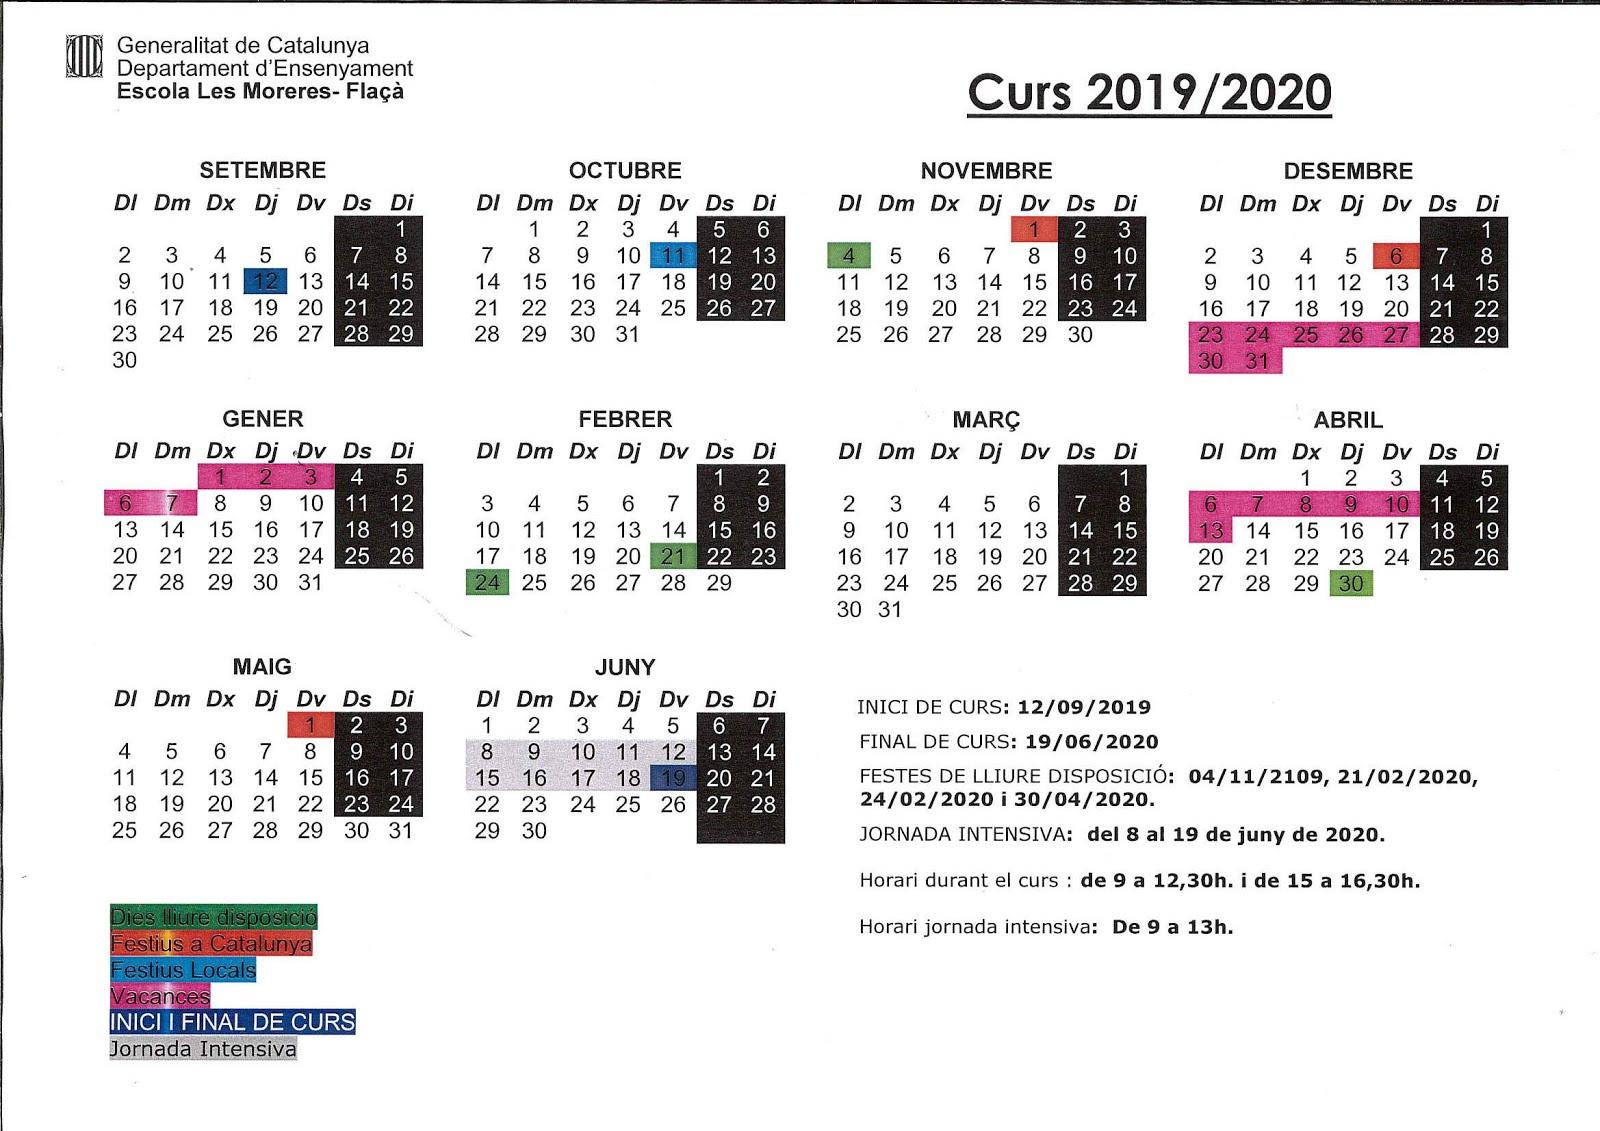 Calendari curs 2019-2020